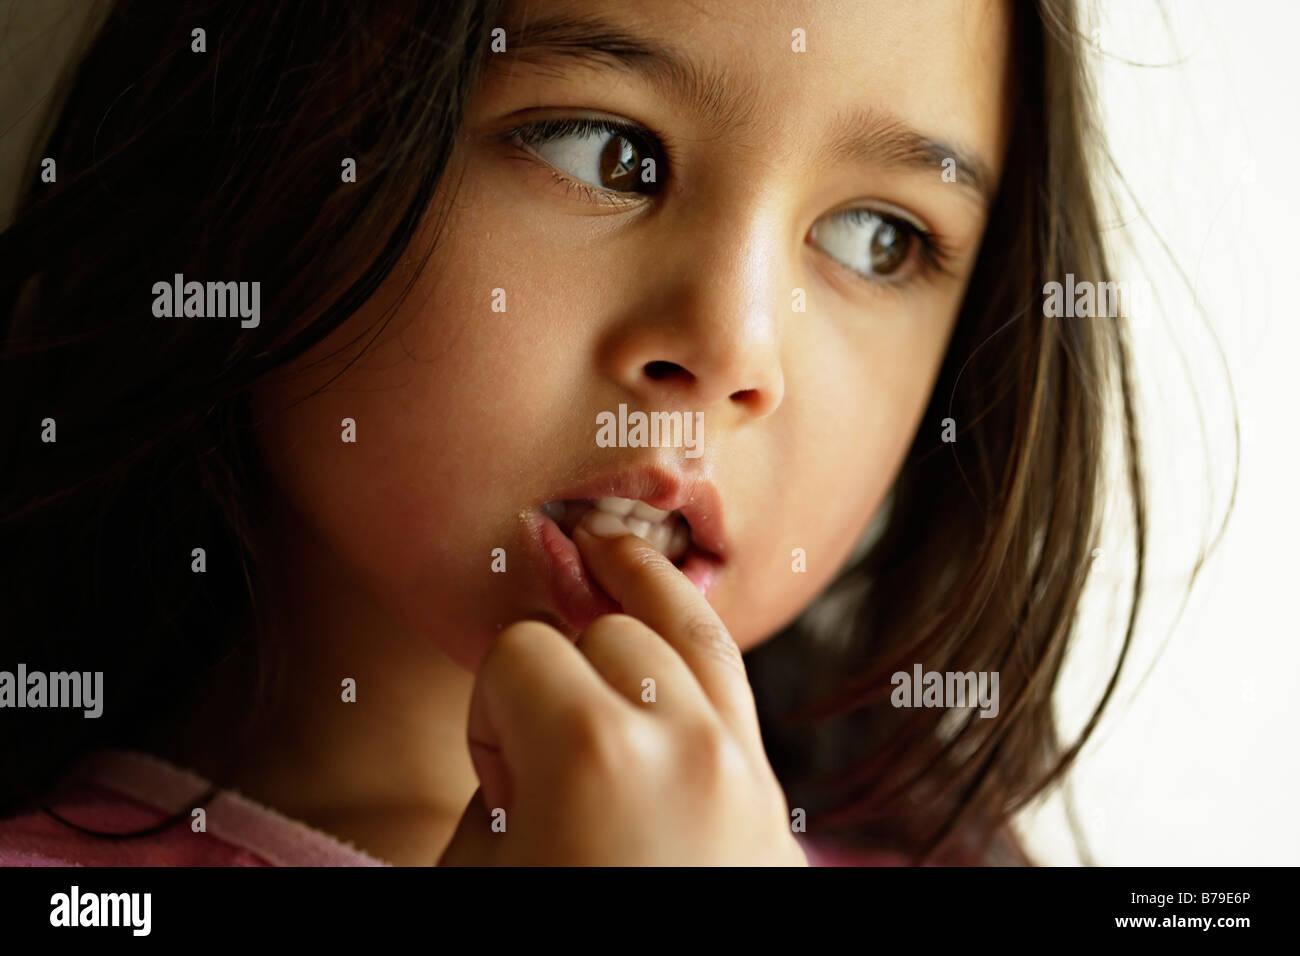 Fünf Jahre altes Mädchen kaut Nägel Stockbild